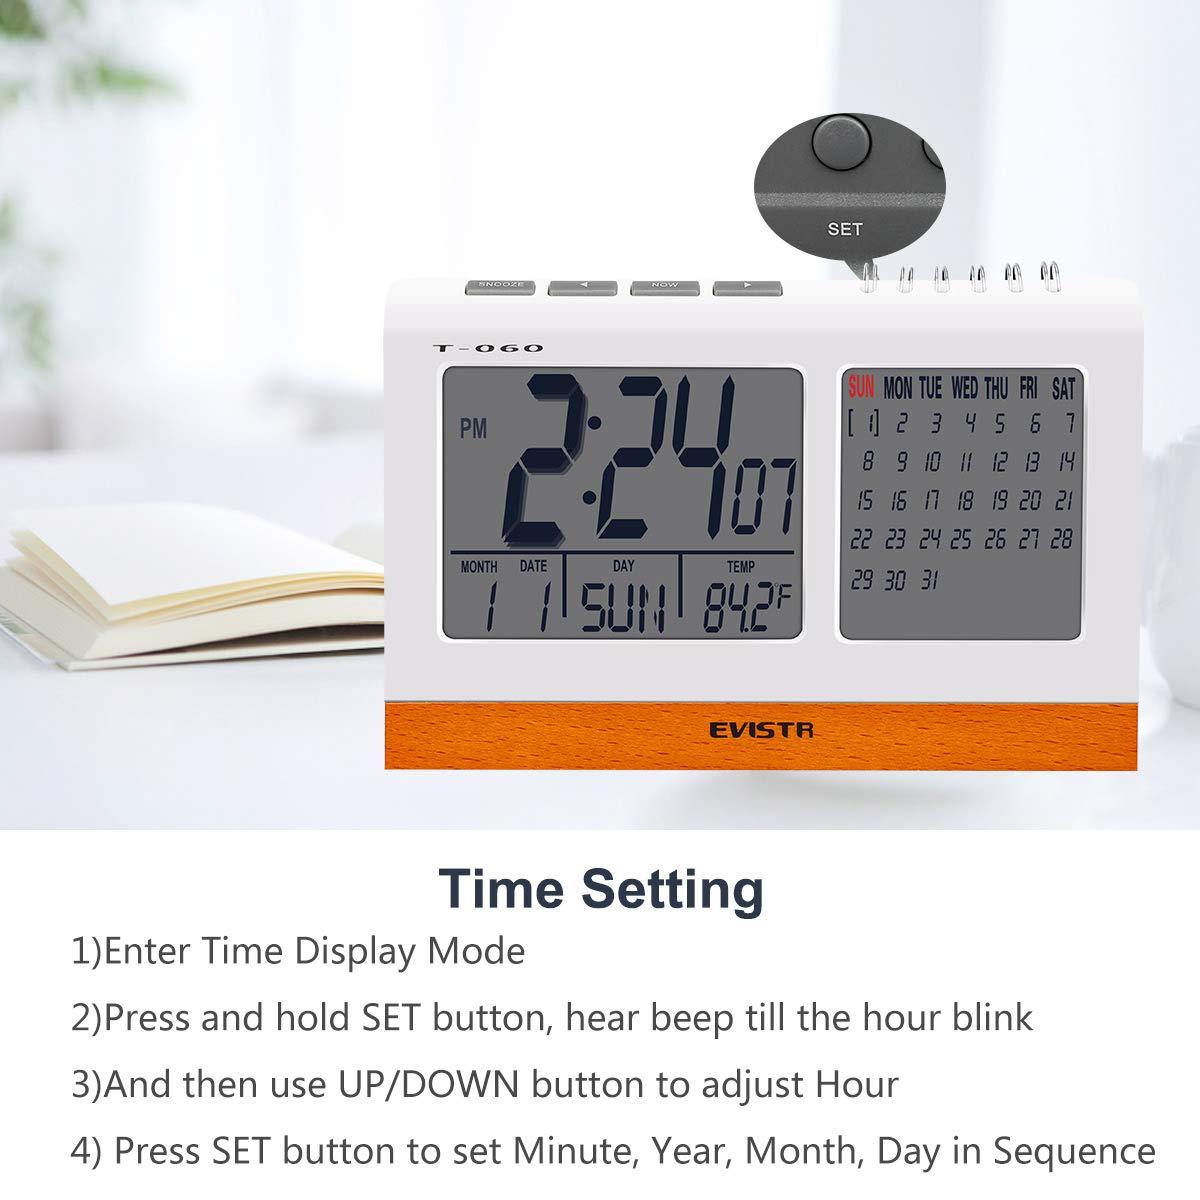 EVISTR Digital Clock Large Display - Desk Clock Battery Operated Alarm Clock with Calendar, Date, Temperature for Office